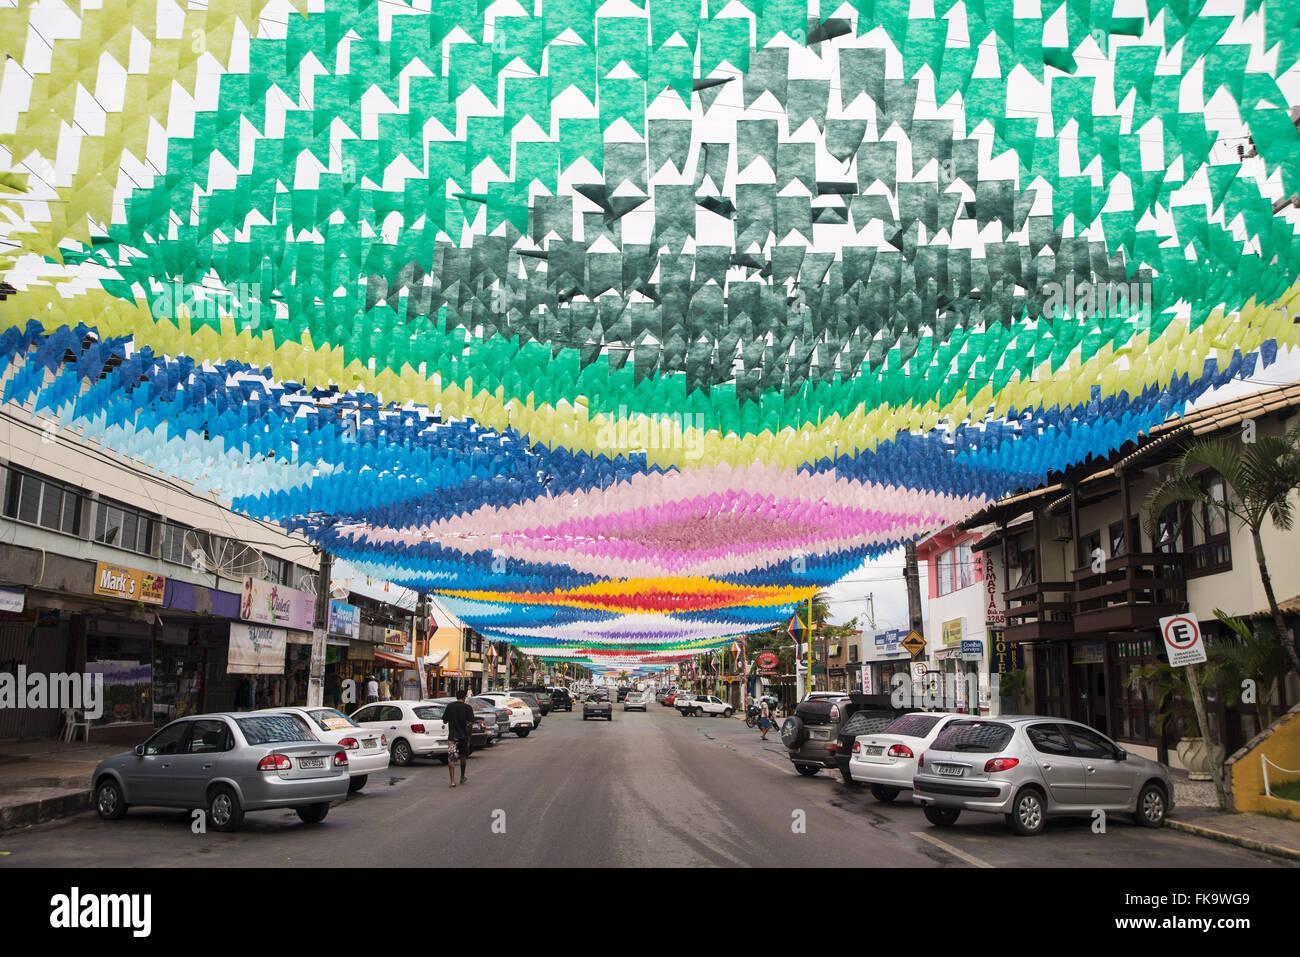 Avenida Getulio Vargas trimmed to Jerk - Stock Image